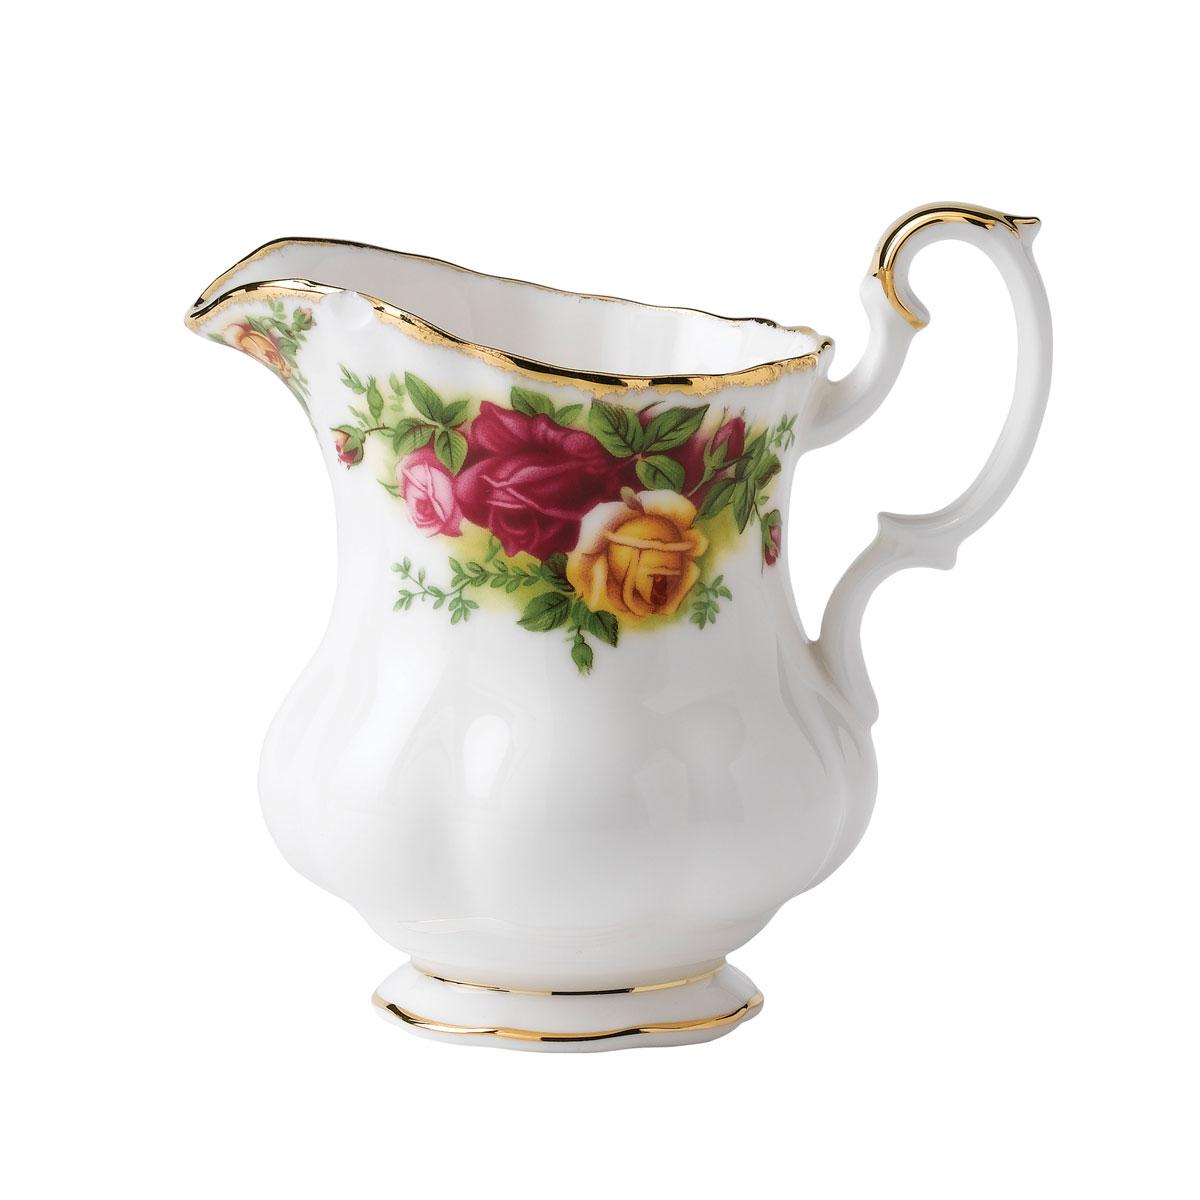 Royal Albert Old Country Roses Creamer 7.5 Oz